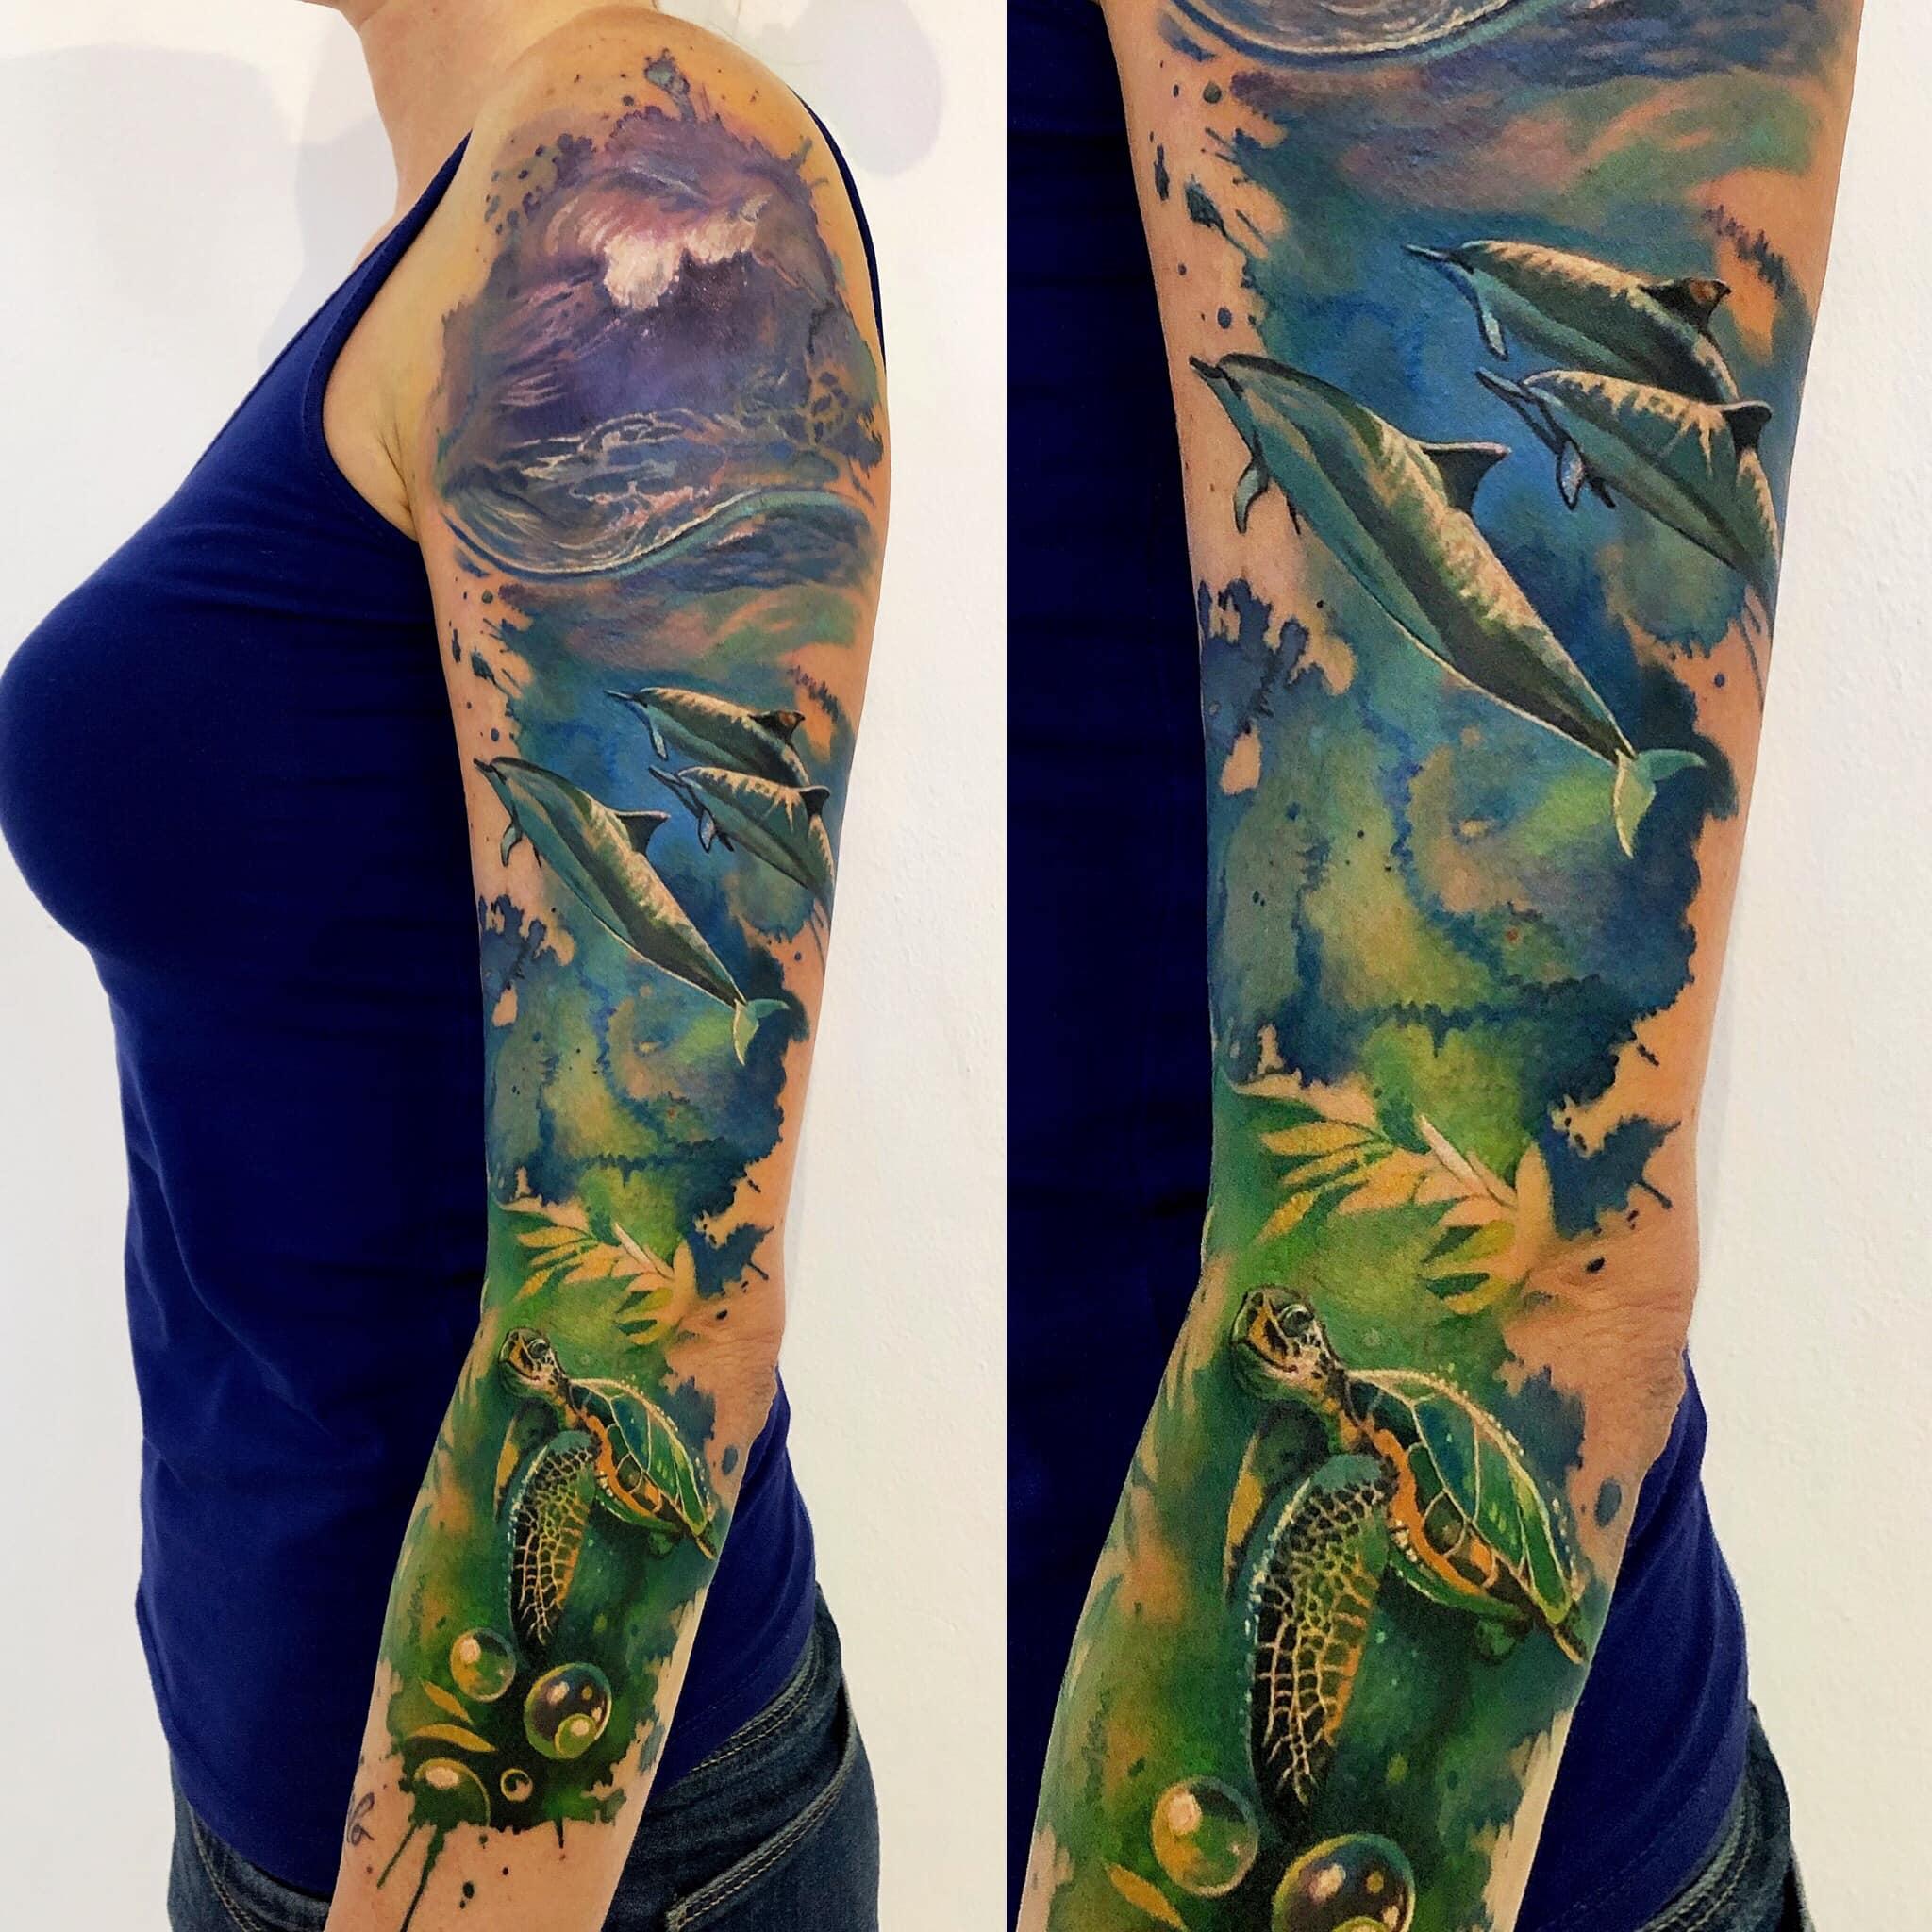 Maui Meherzi - Opus Magnum Tattoo Studio Wien - under the sea